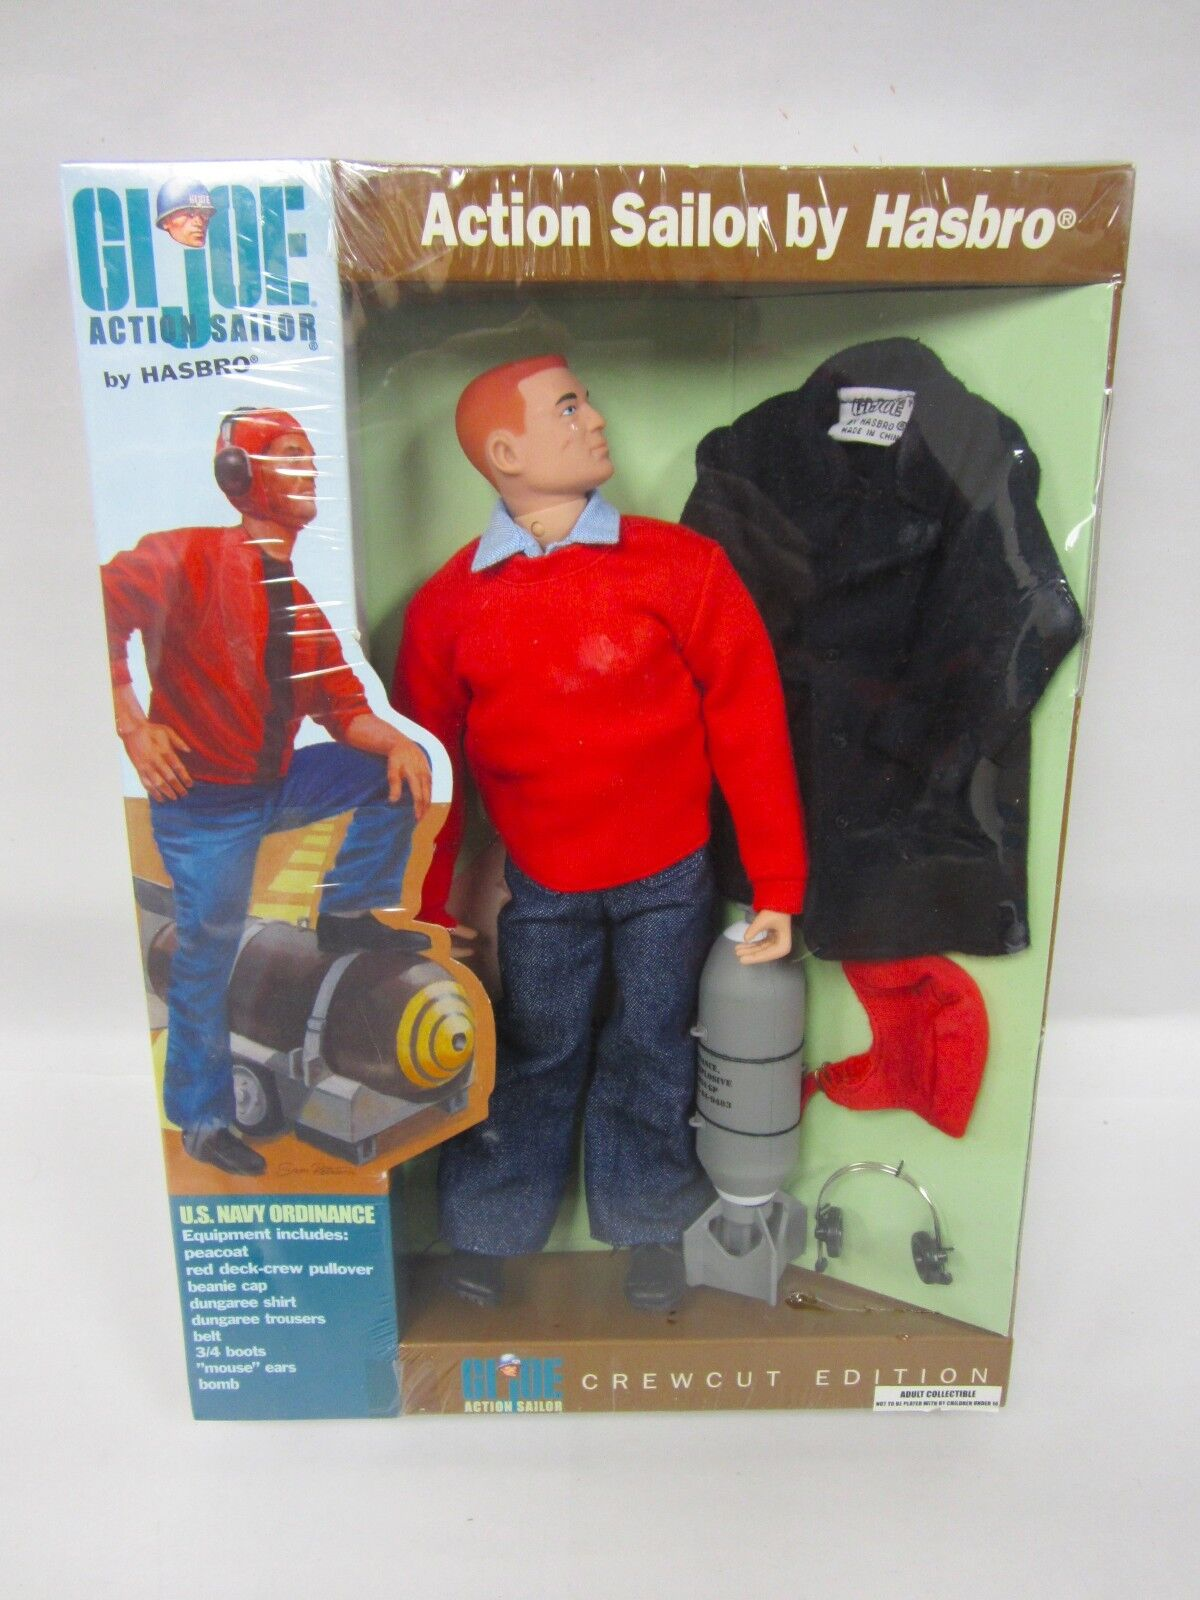 2004 G.I. JOE BY HASBRO CREWCUT EDITION MISB 12